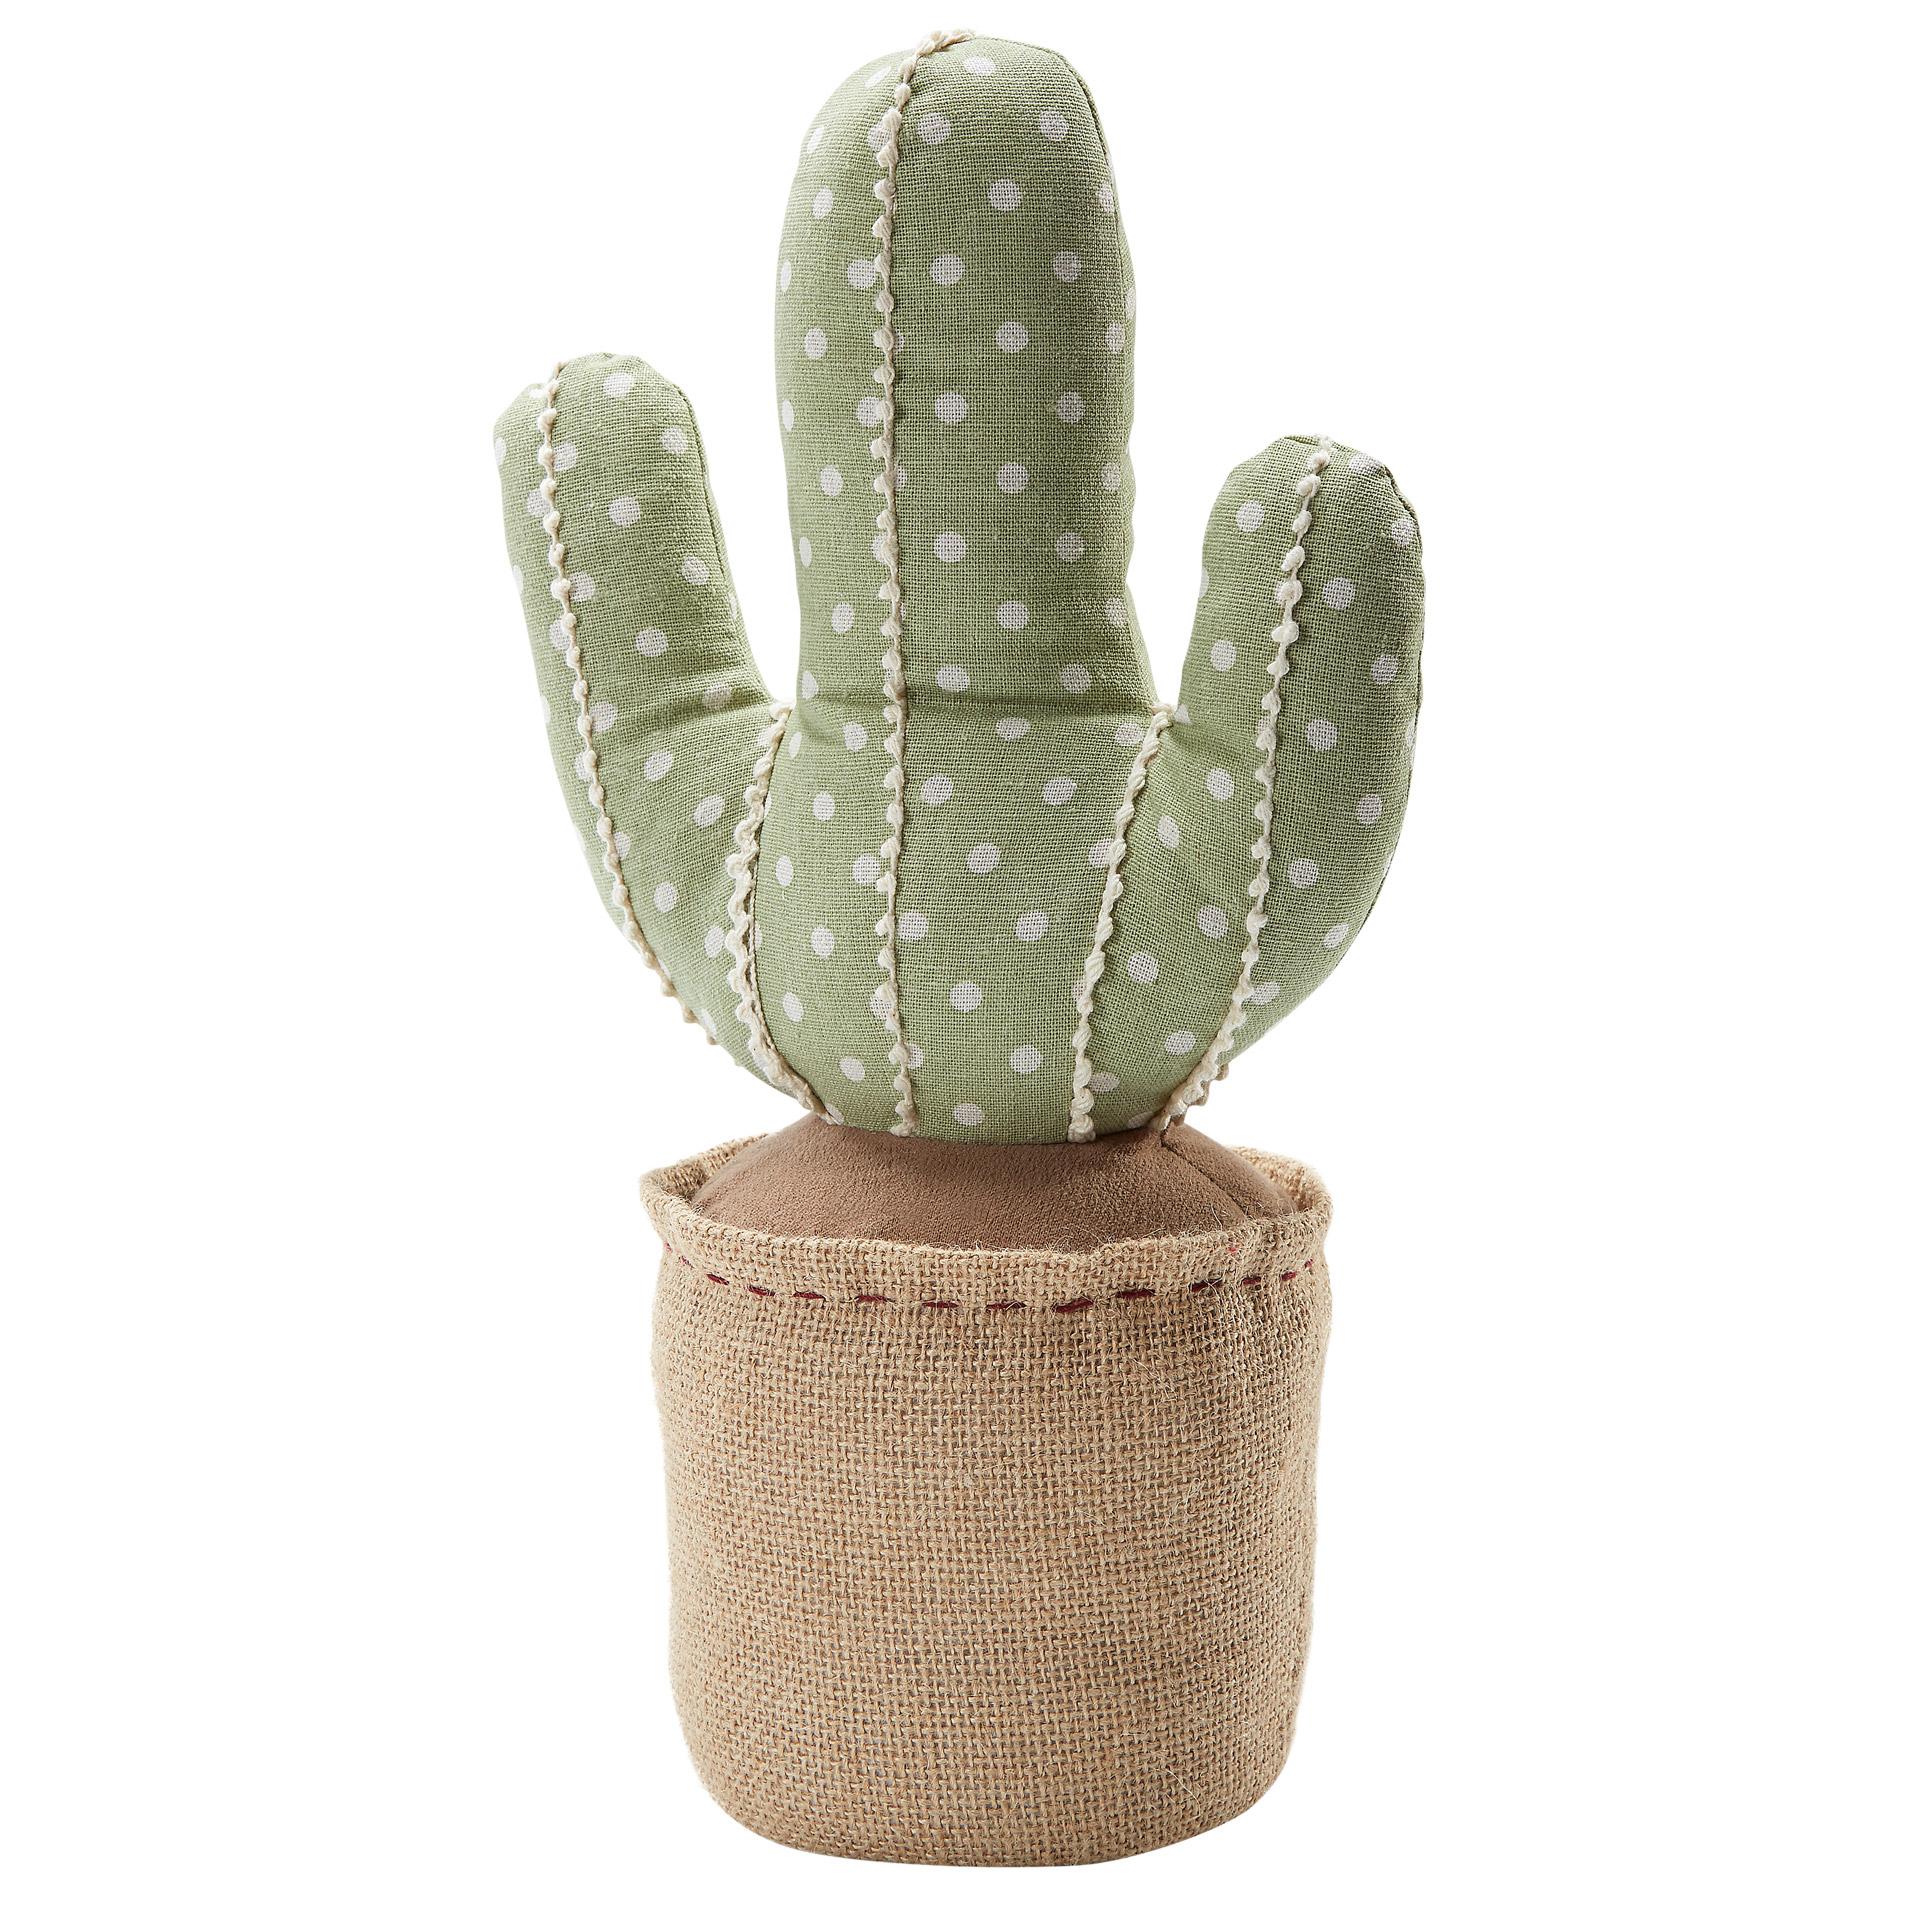 Türstopper Kaktus (35x10x10, grün)